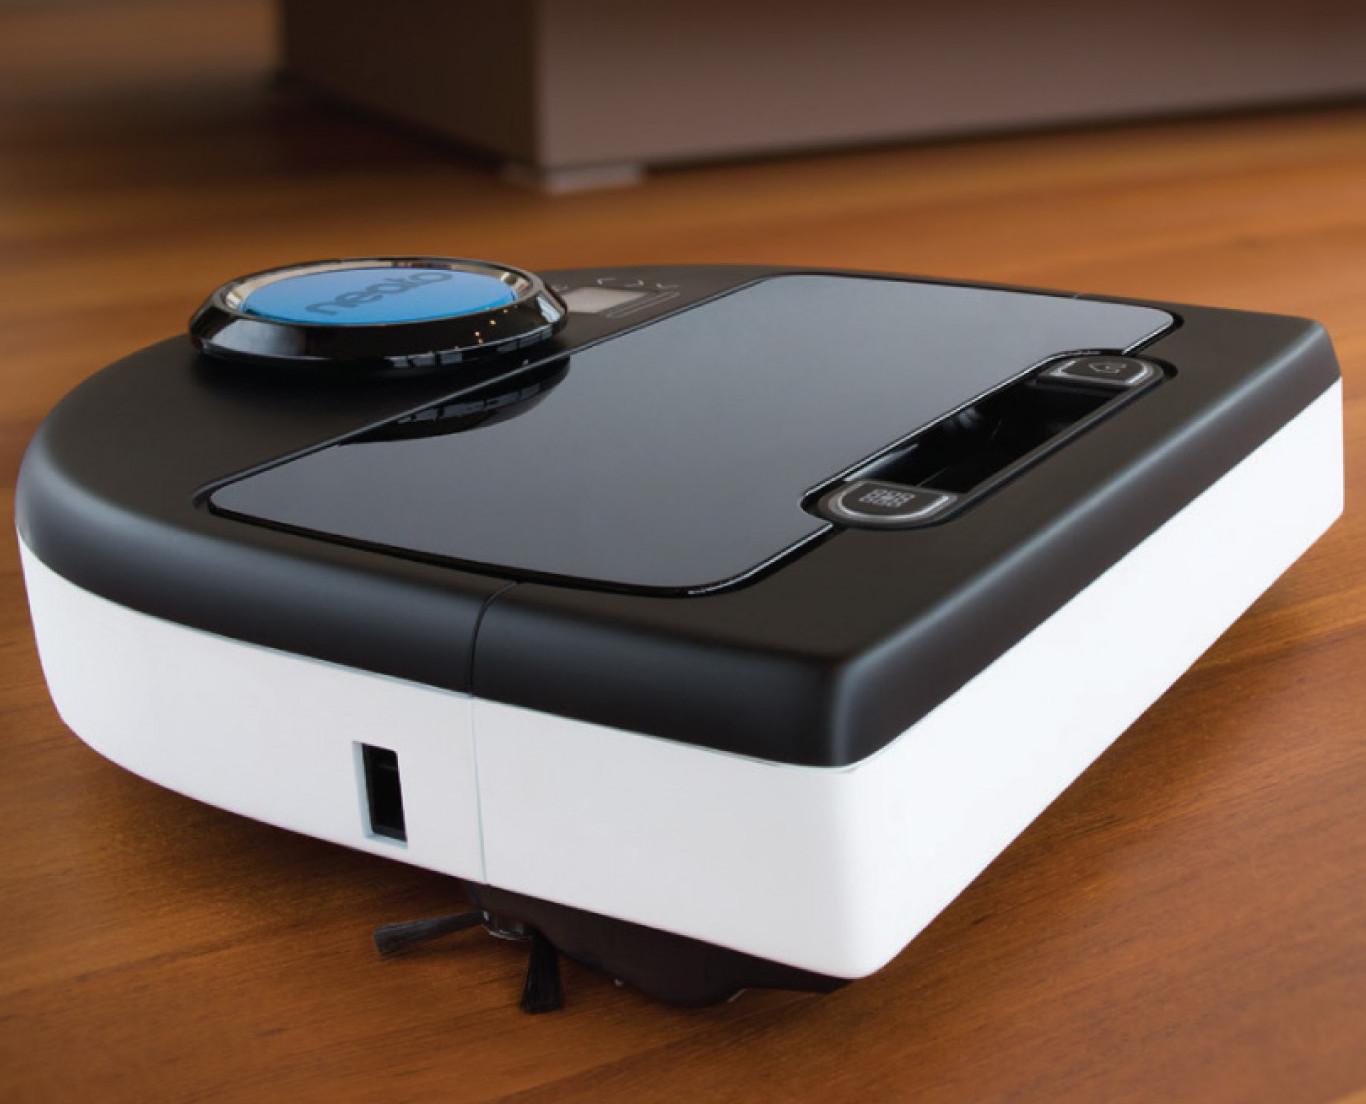 robotti imuri neato botvac d85 robotti imurit. Black Bedroom Furniture Sets. Home Design Ideas